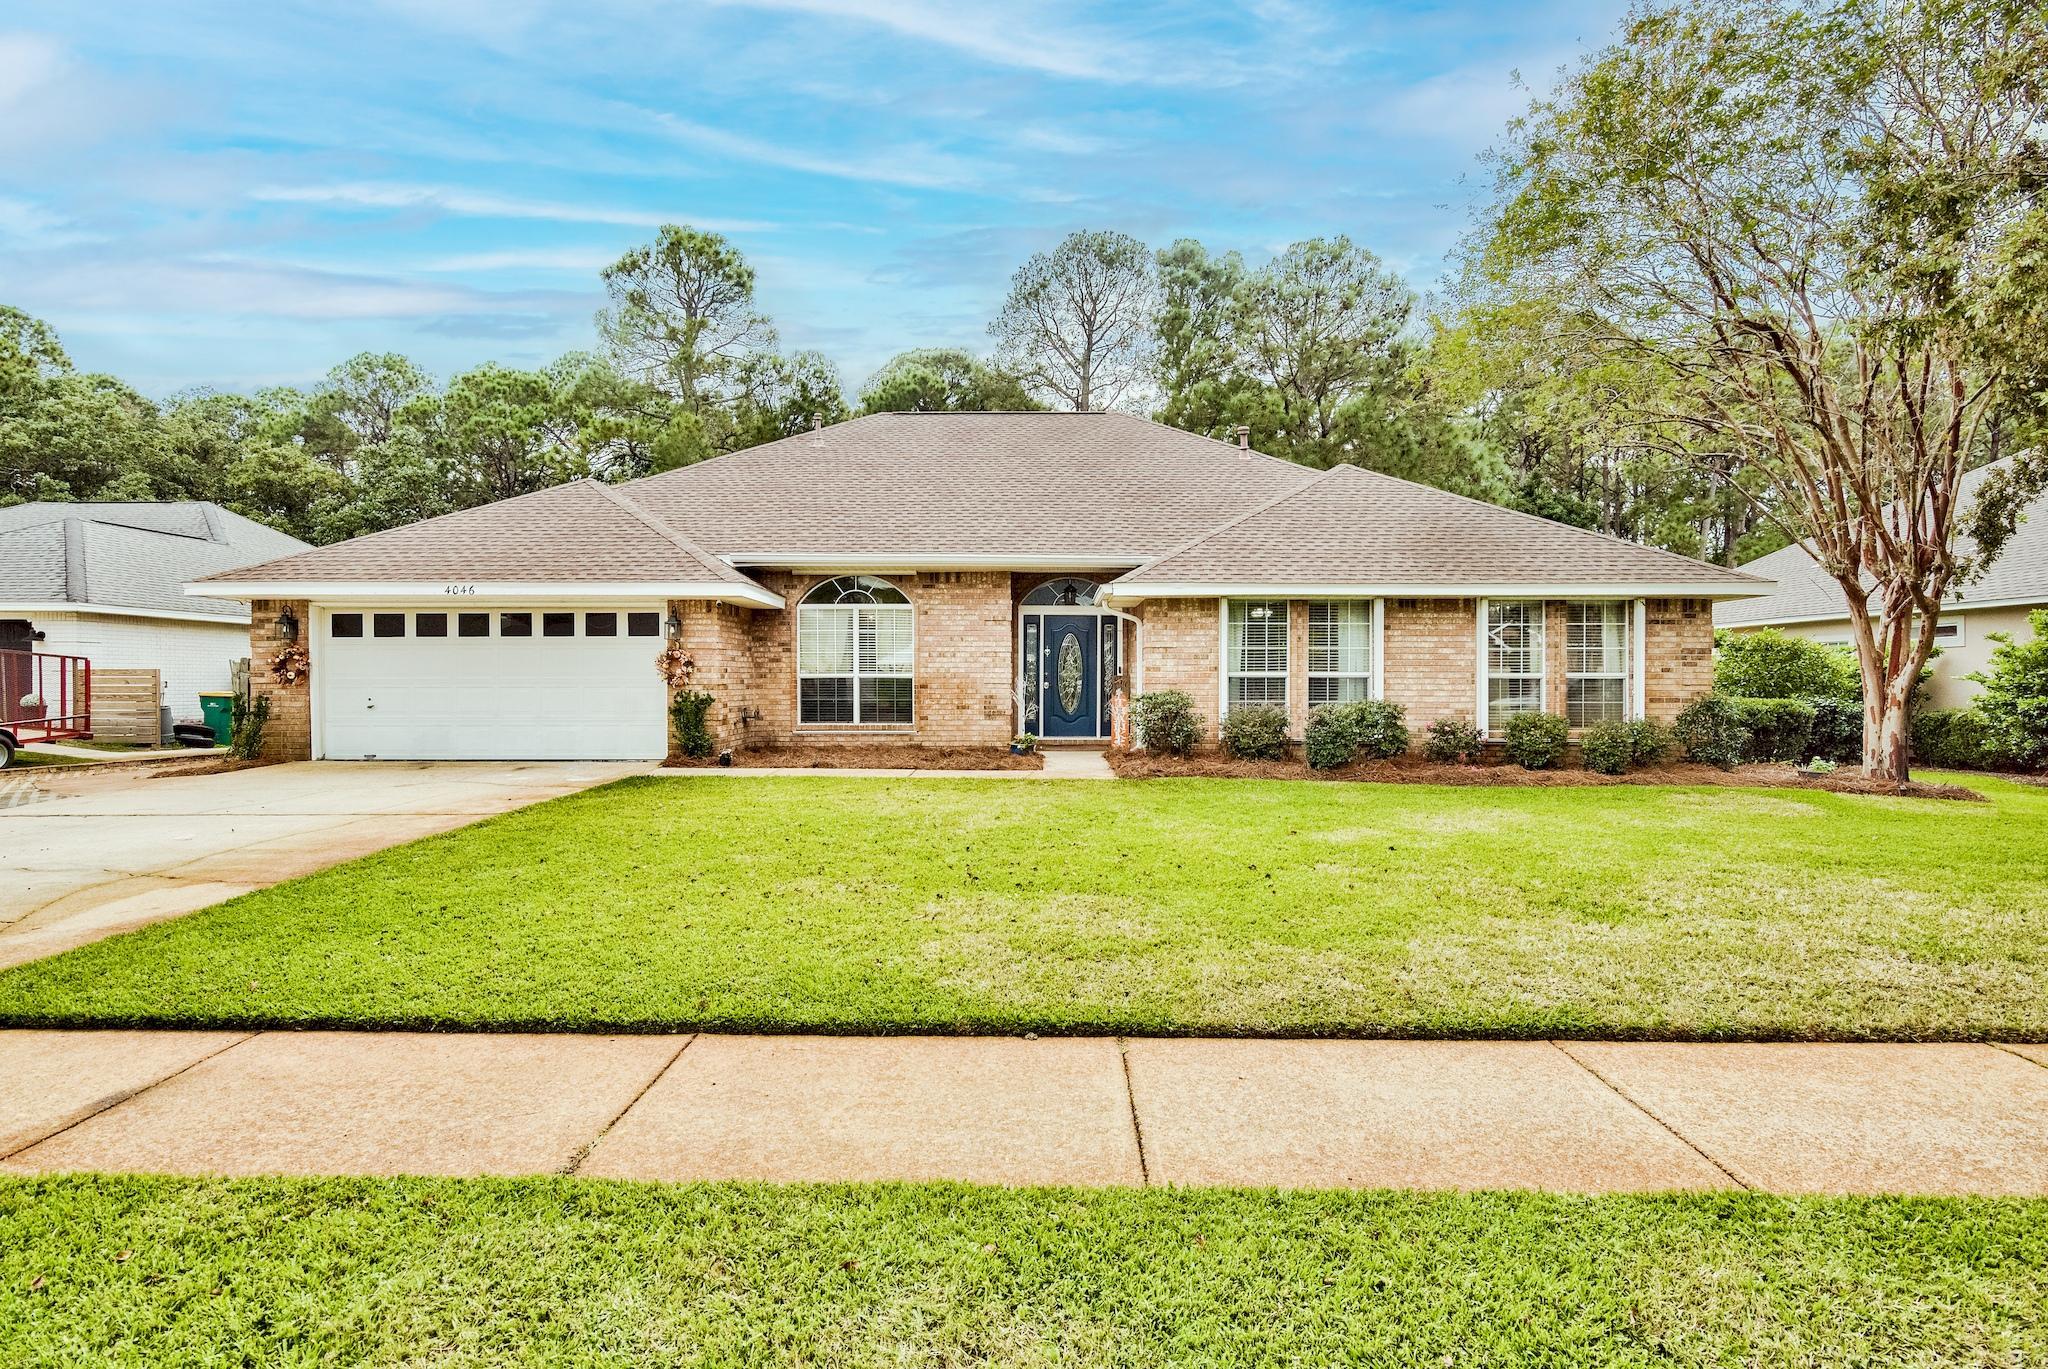 Photo of home for sale at 4046 Lauren, Destin FL